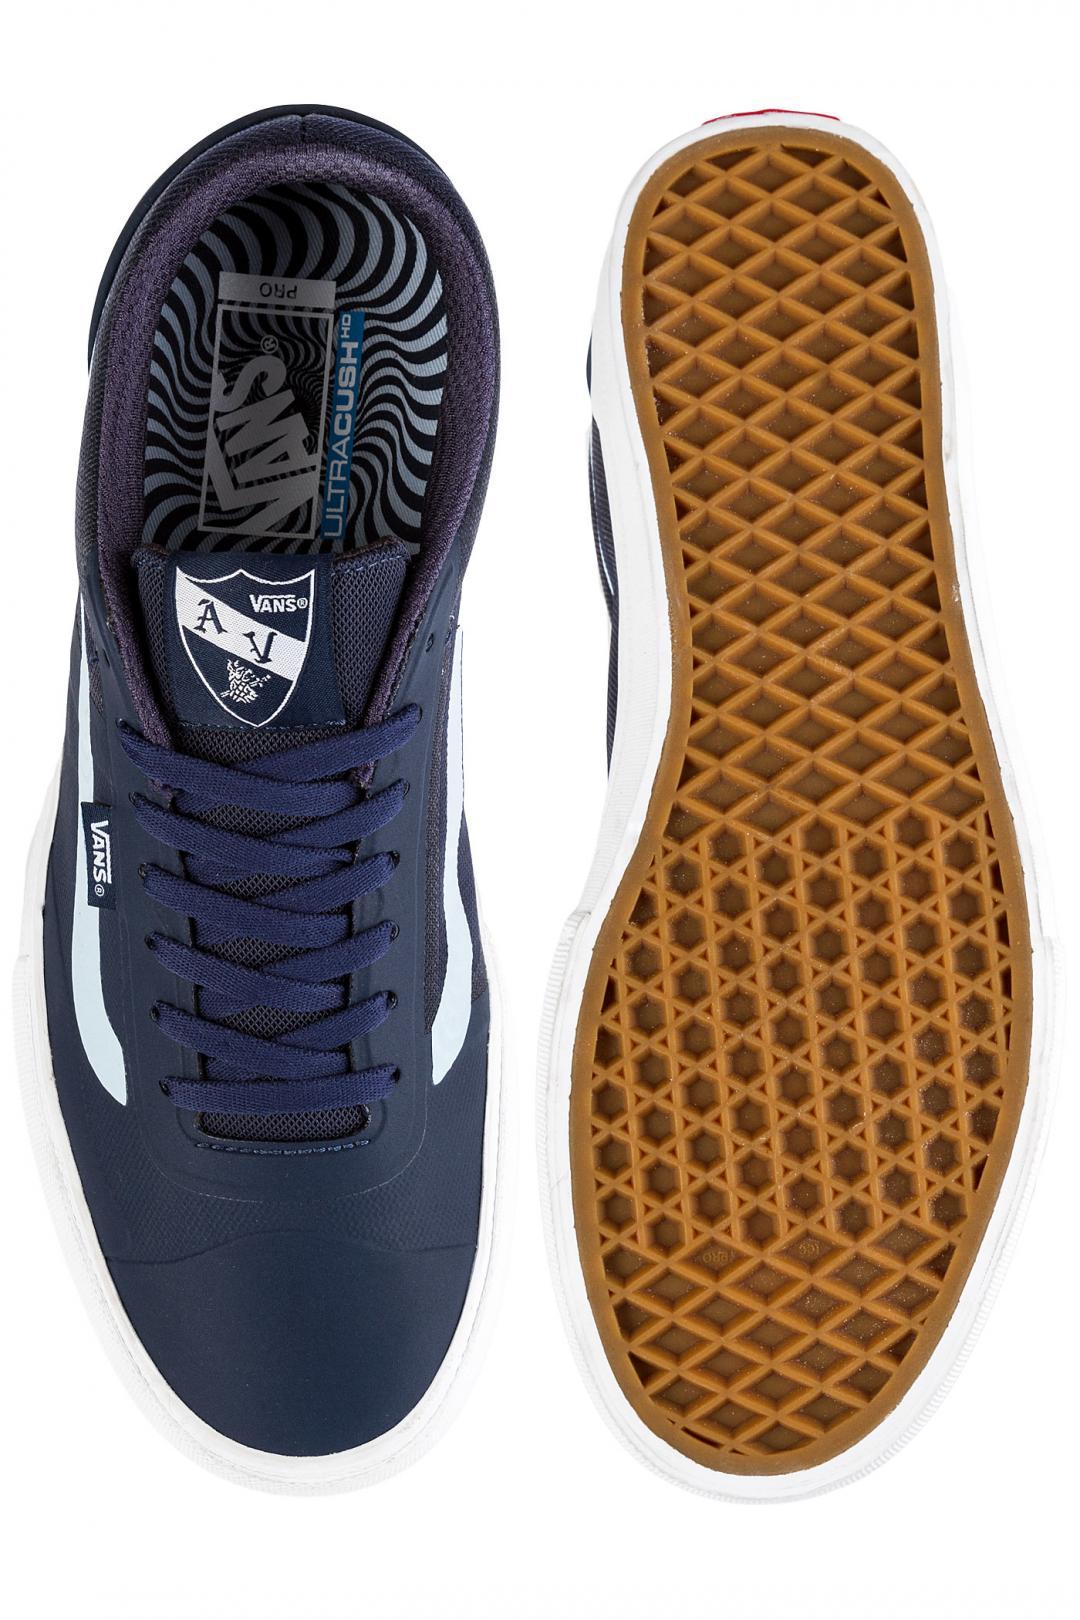 Uomo Vans x Spitfire AV Rapidweld Pro dress blues | Sneakers low top